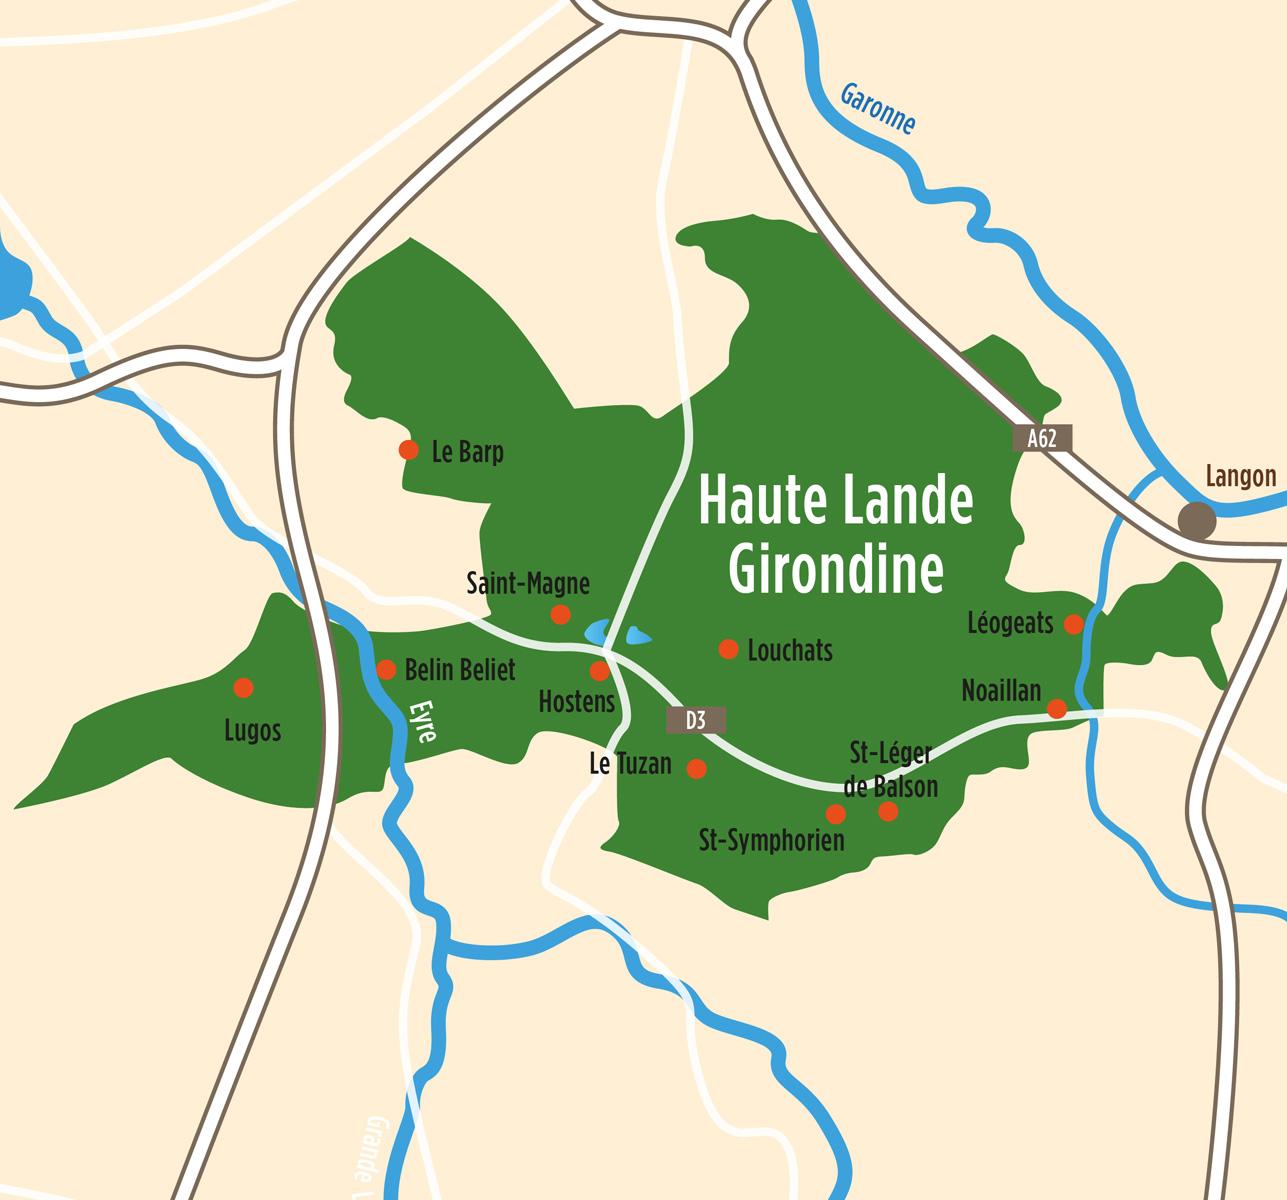 Haute Lande Girondine